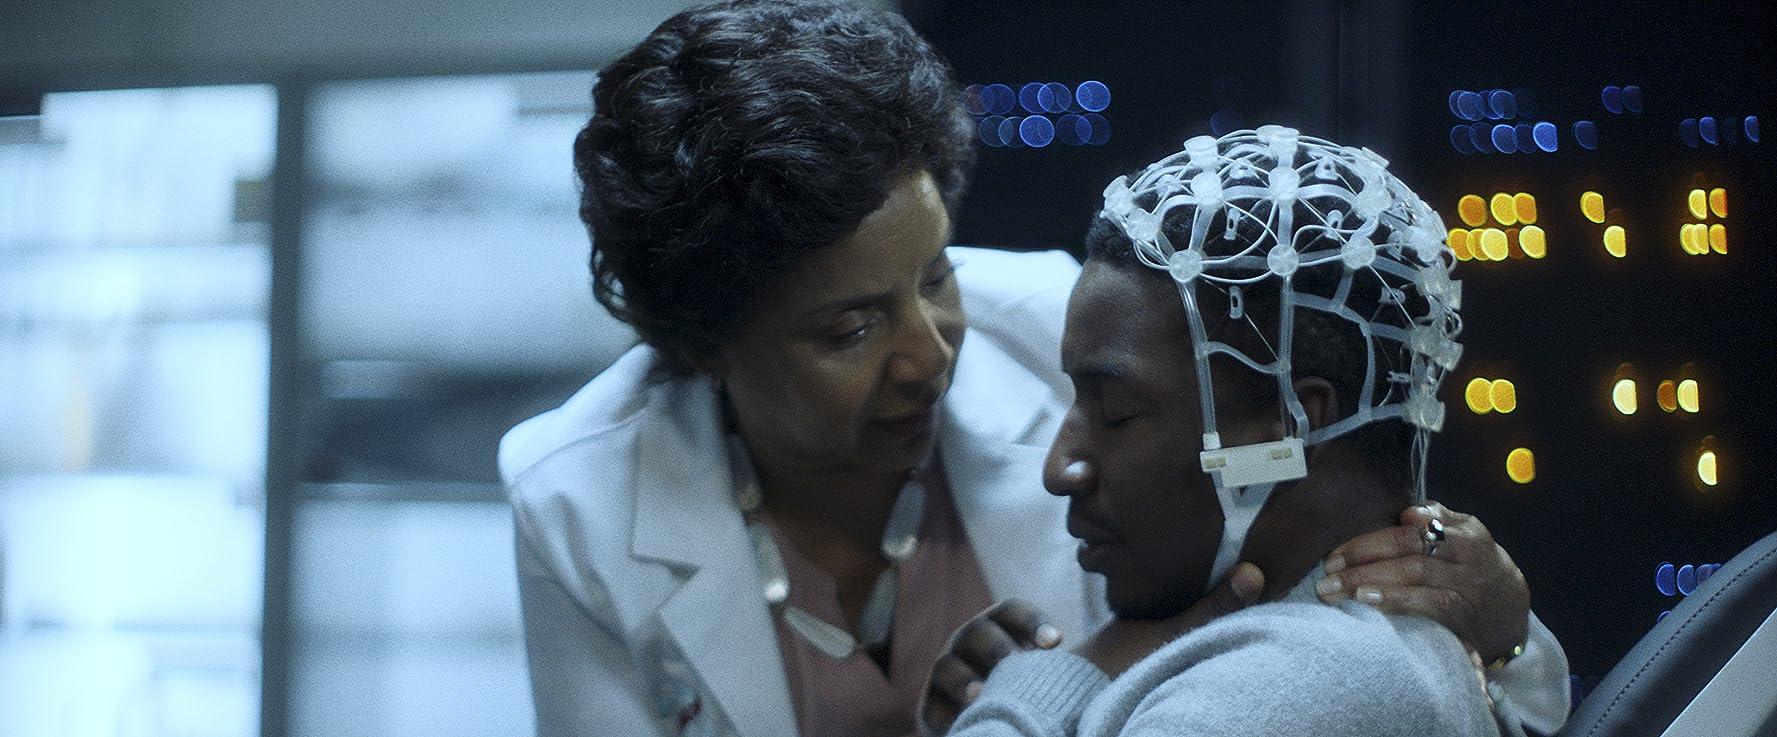 Phylicia Rashad, Mamoudou Athie, and Lillian Brooks in Black Box (2020)